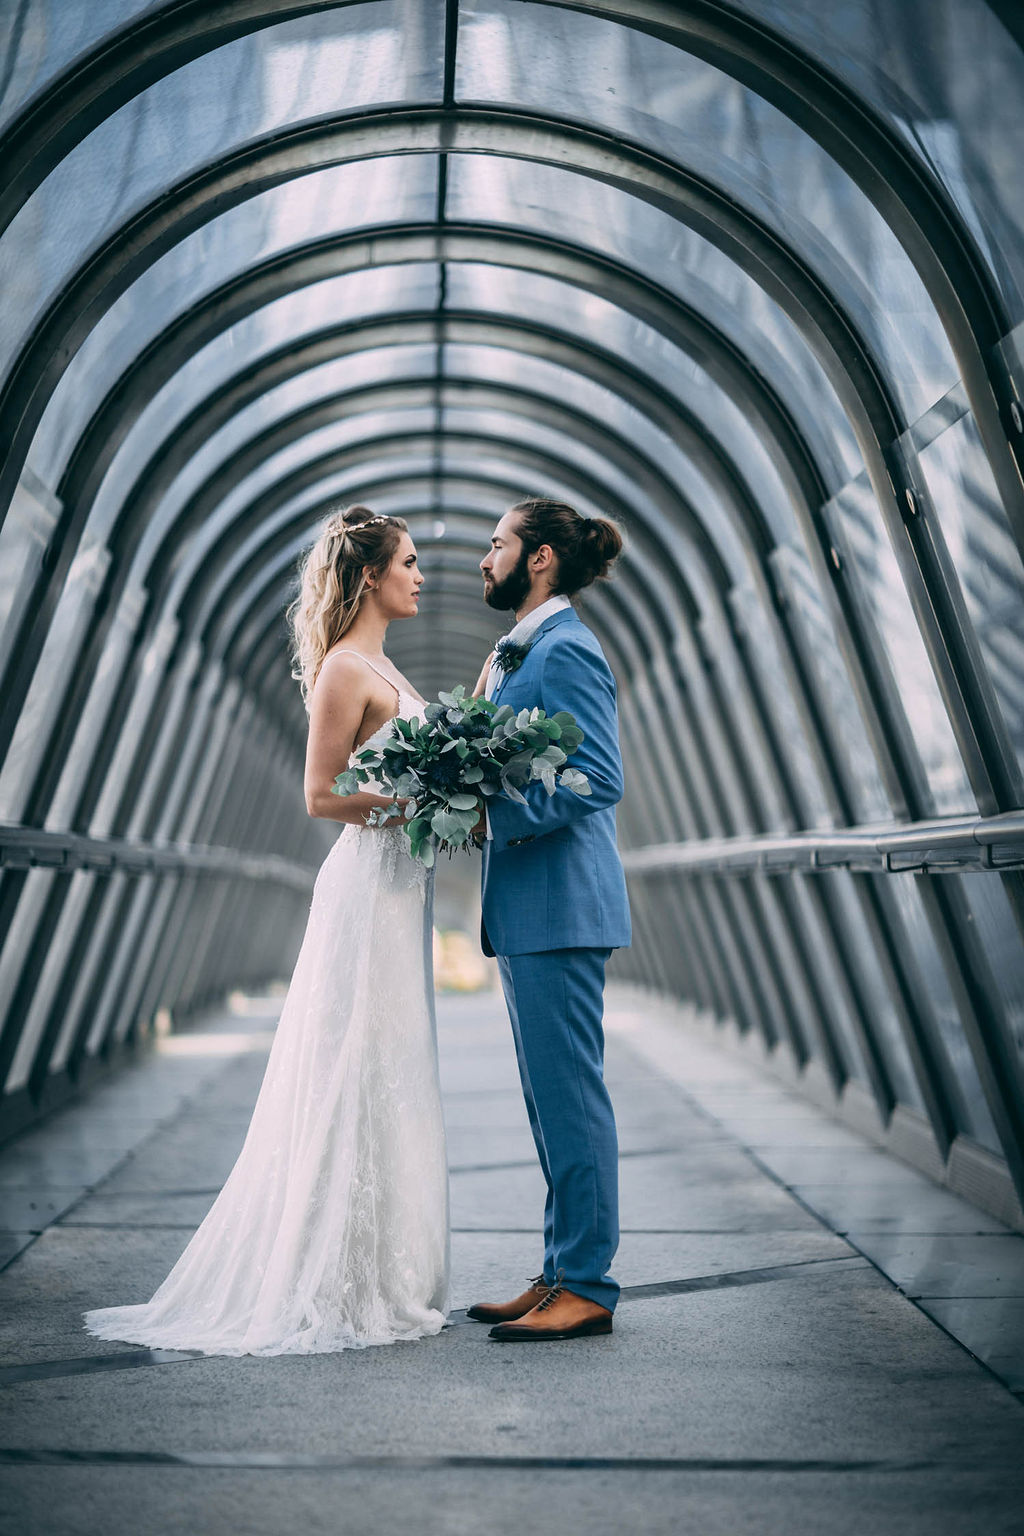 1_23_romantique_couple_4_looks_sidneyonthemoon_photographe_chrisvonmartial_robe_mariee_costume_paris_wedding_web